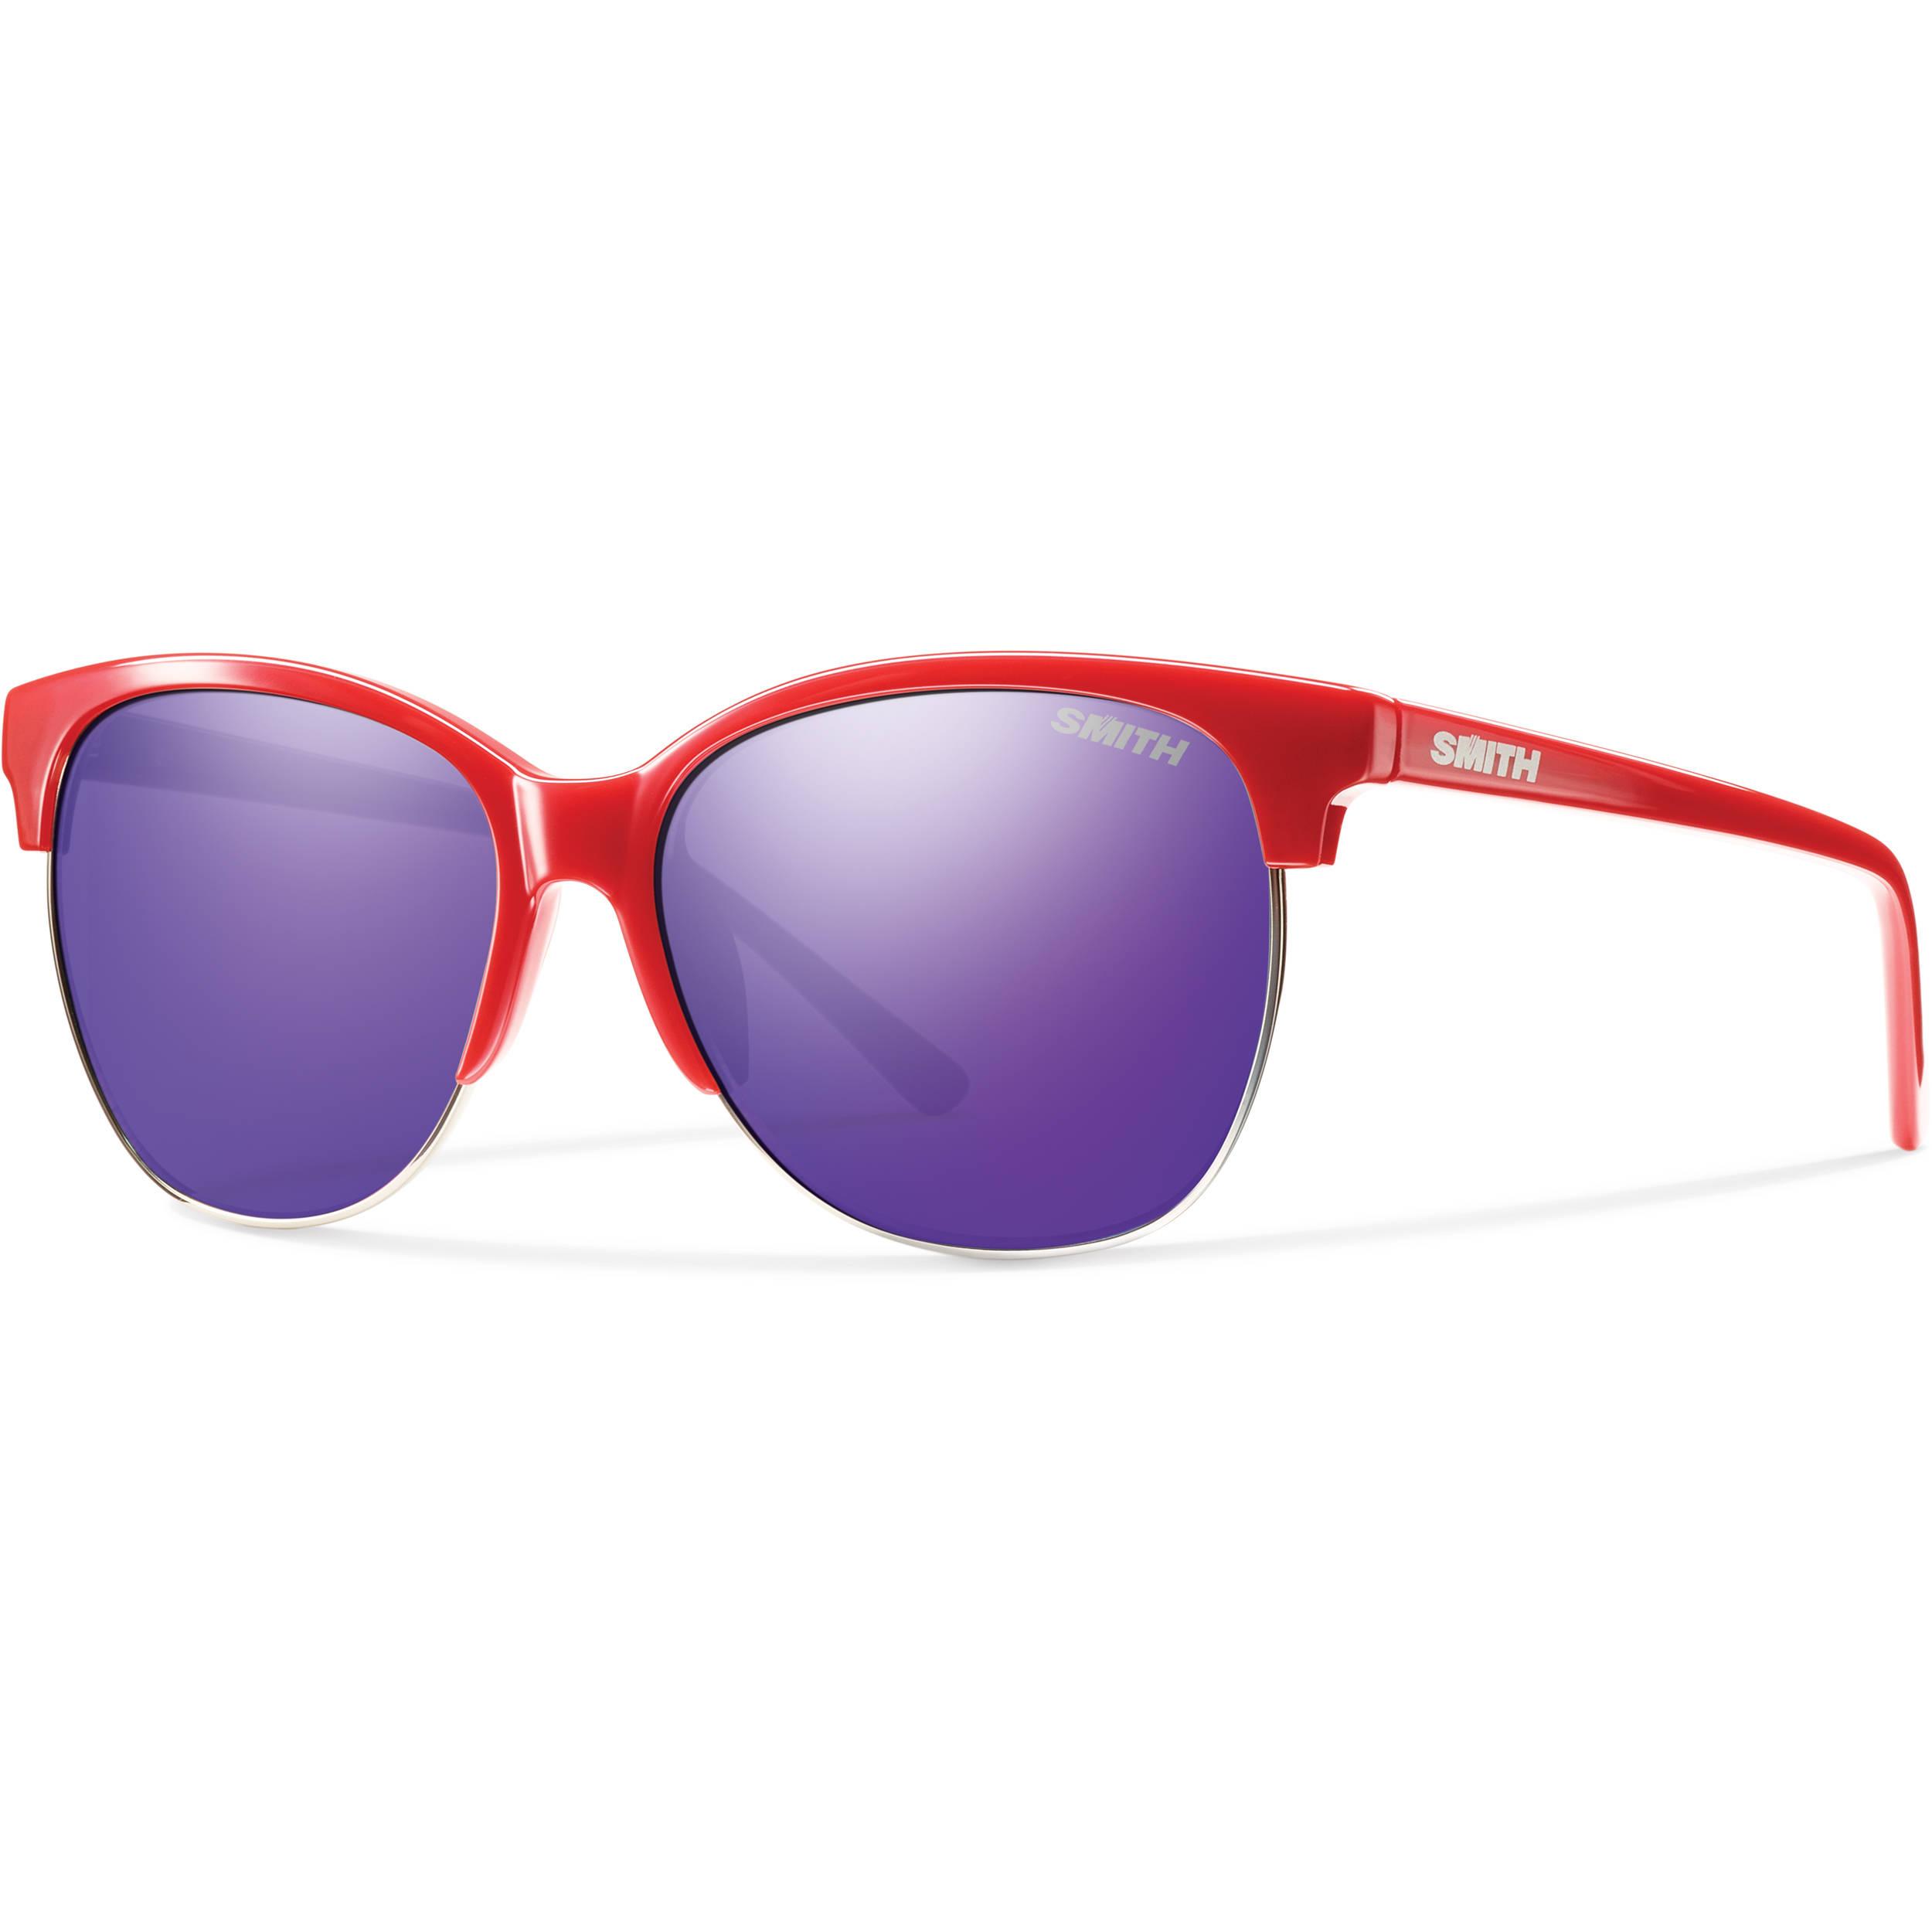 3761812789 Smith Optics Sunglasses